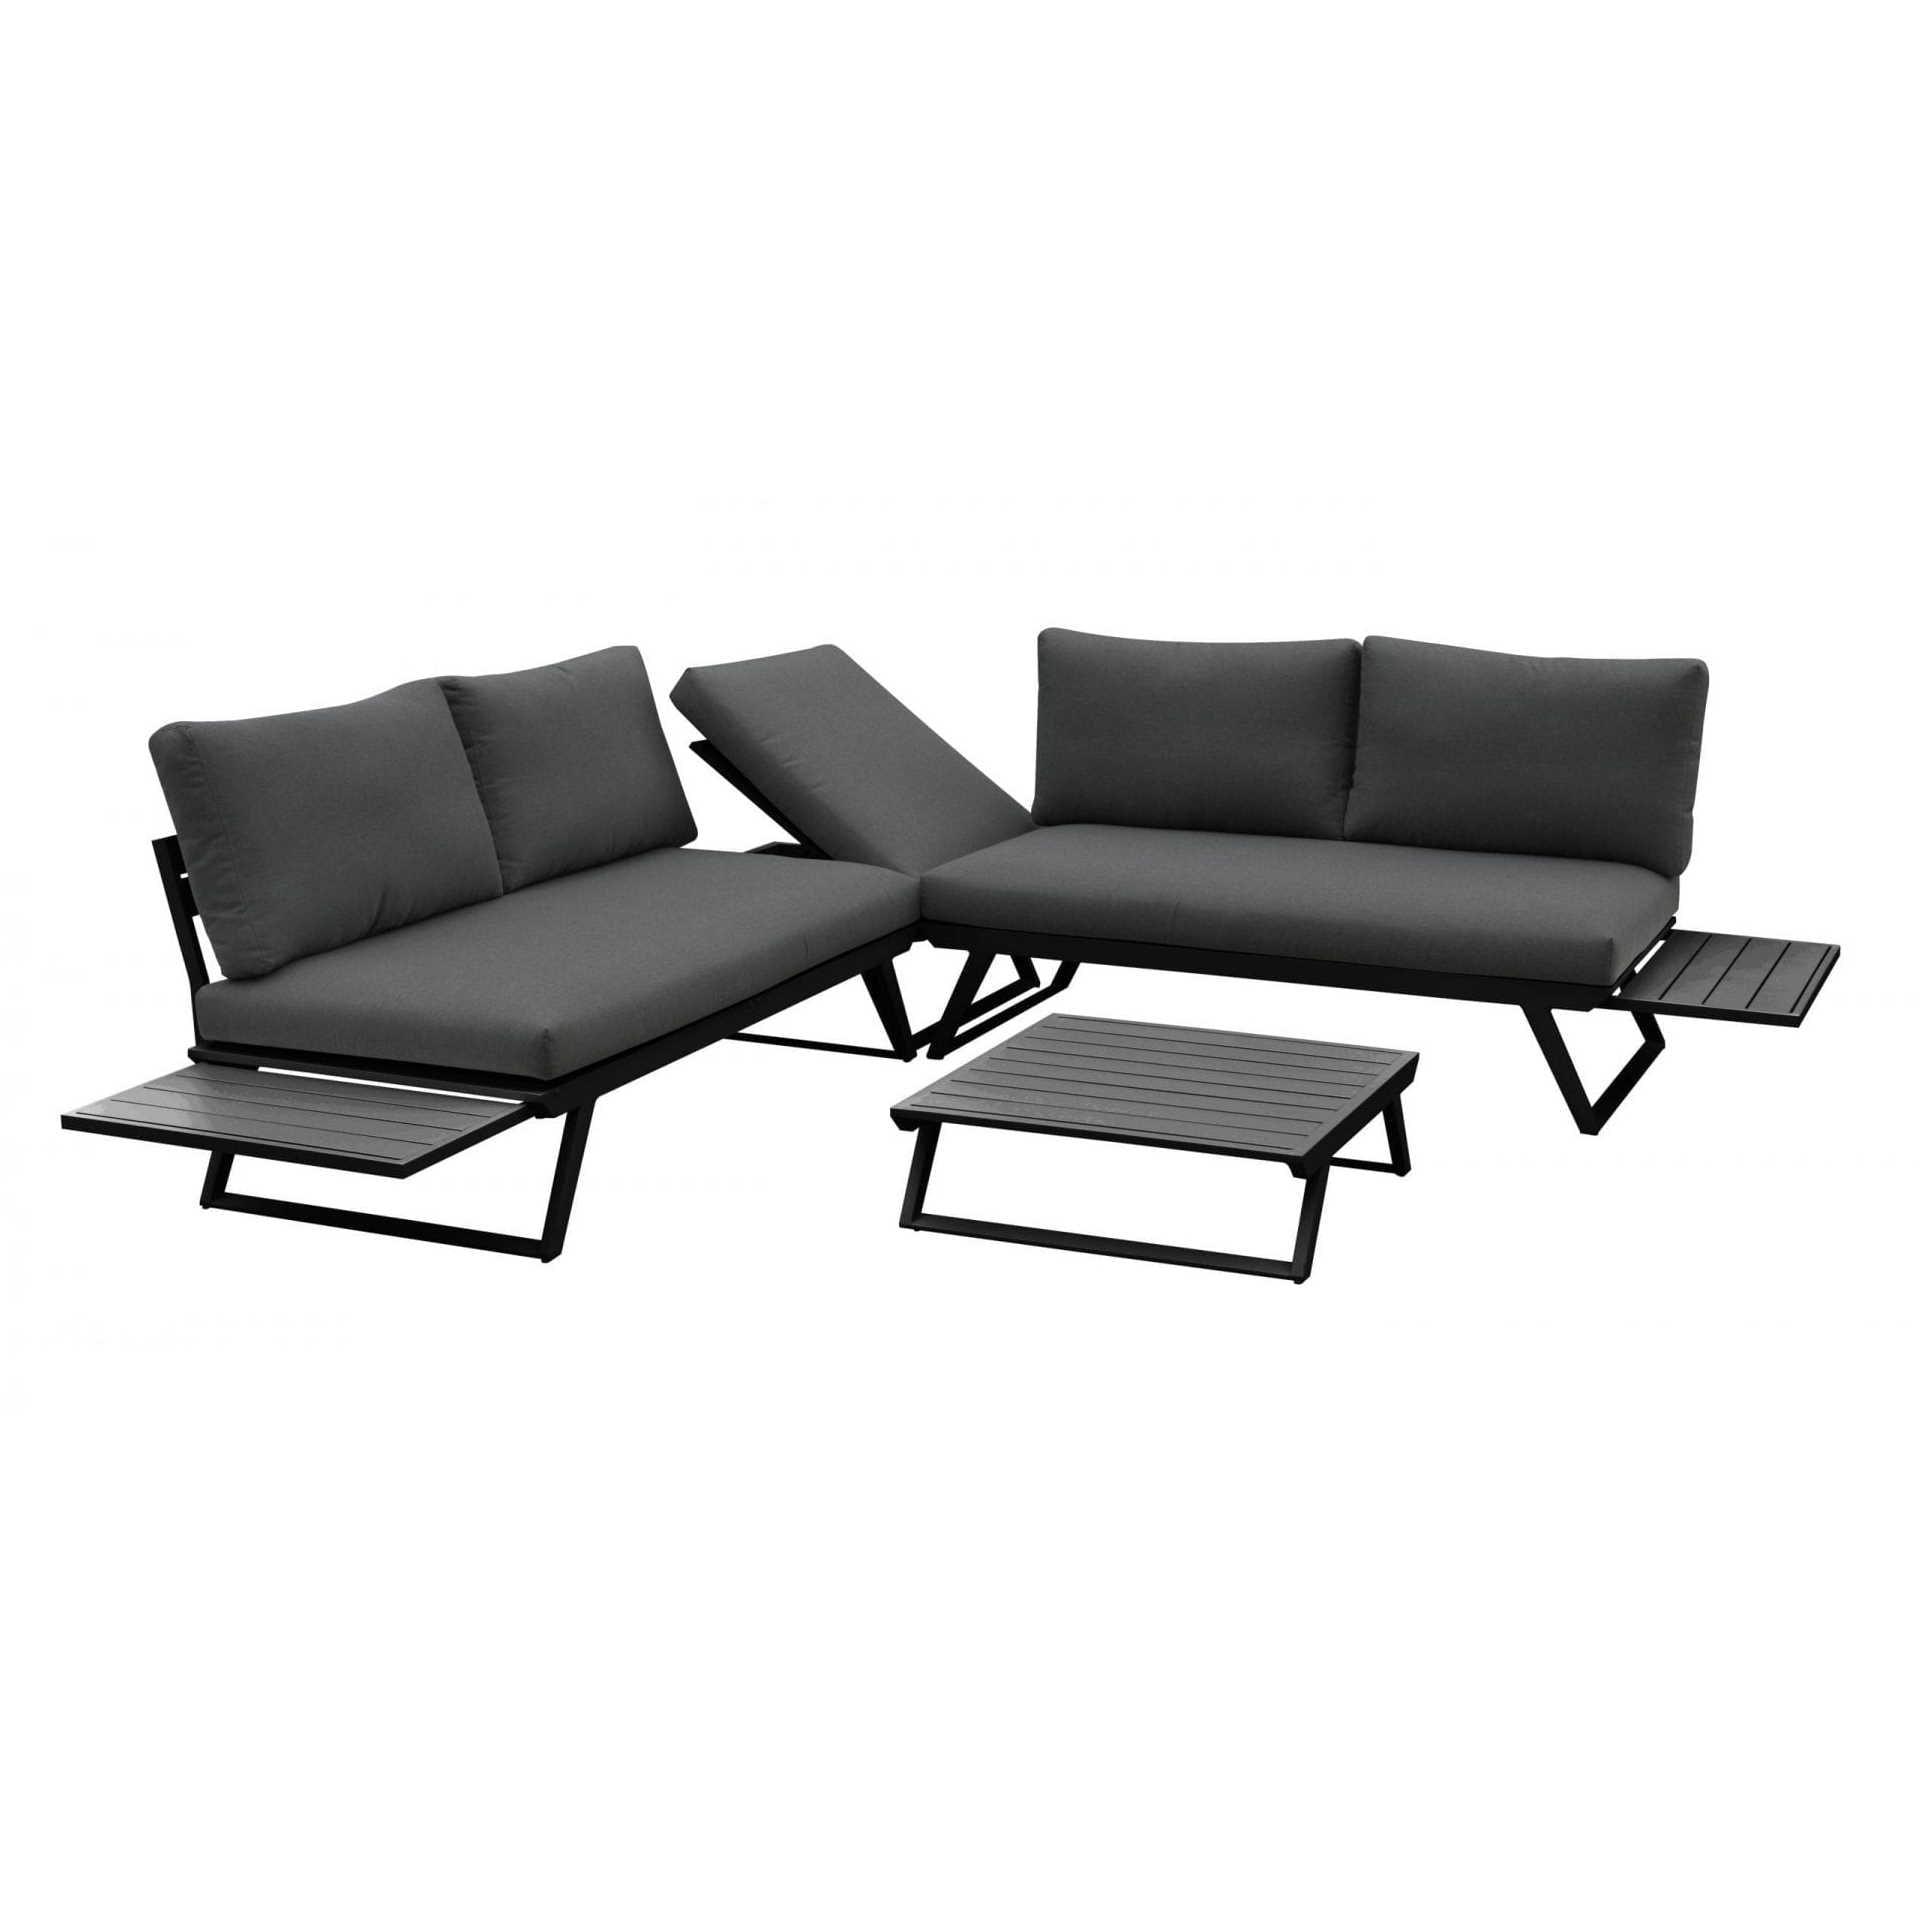 Gardenart Fleksibel Hjørnesofa Med Bord I Sort Aluminium. Hagemøbler og utemøbler - Fine design